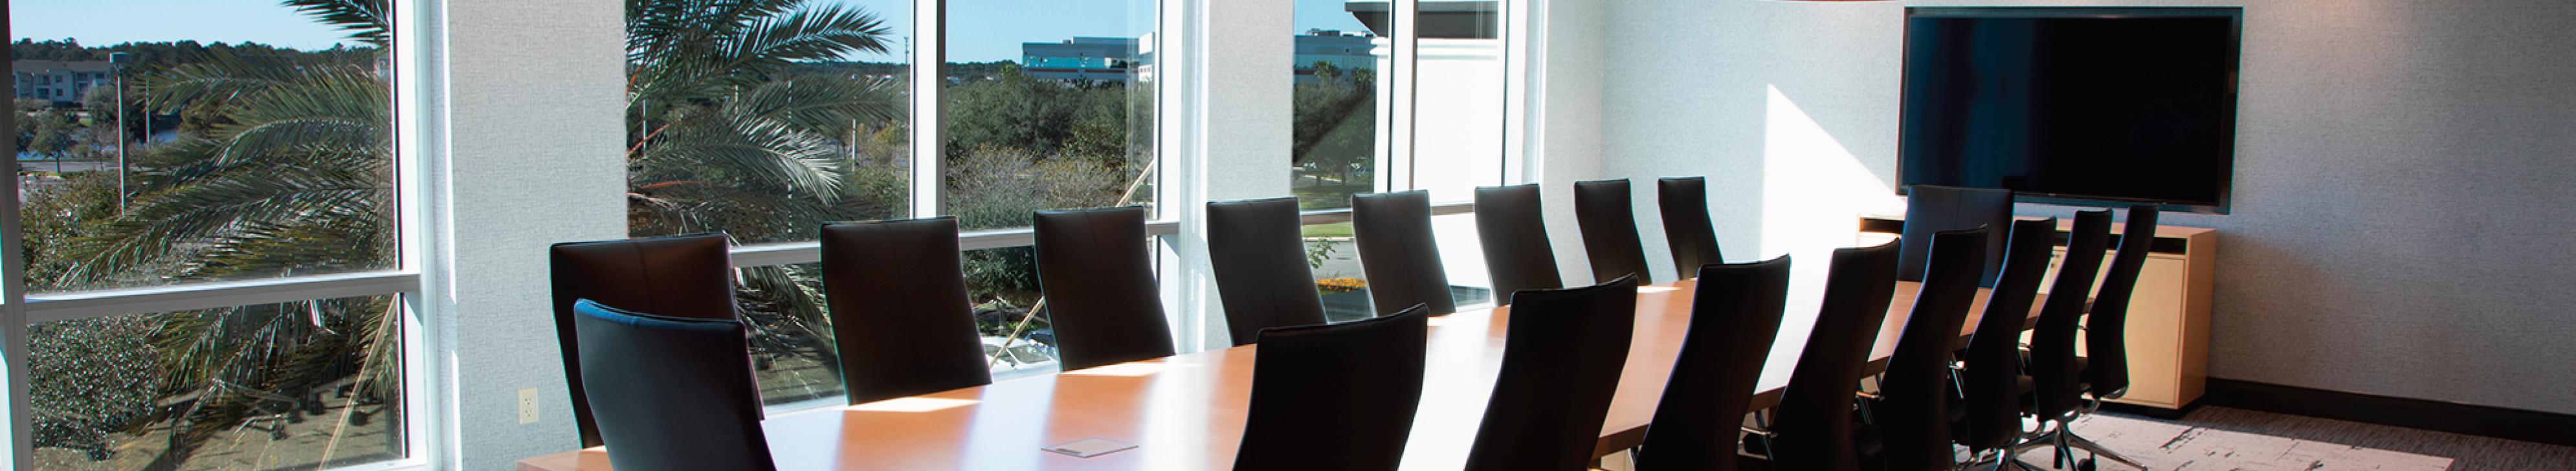 Fortegra Conference Room